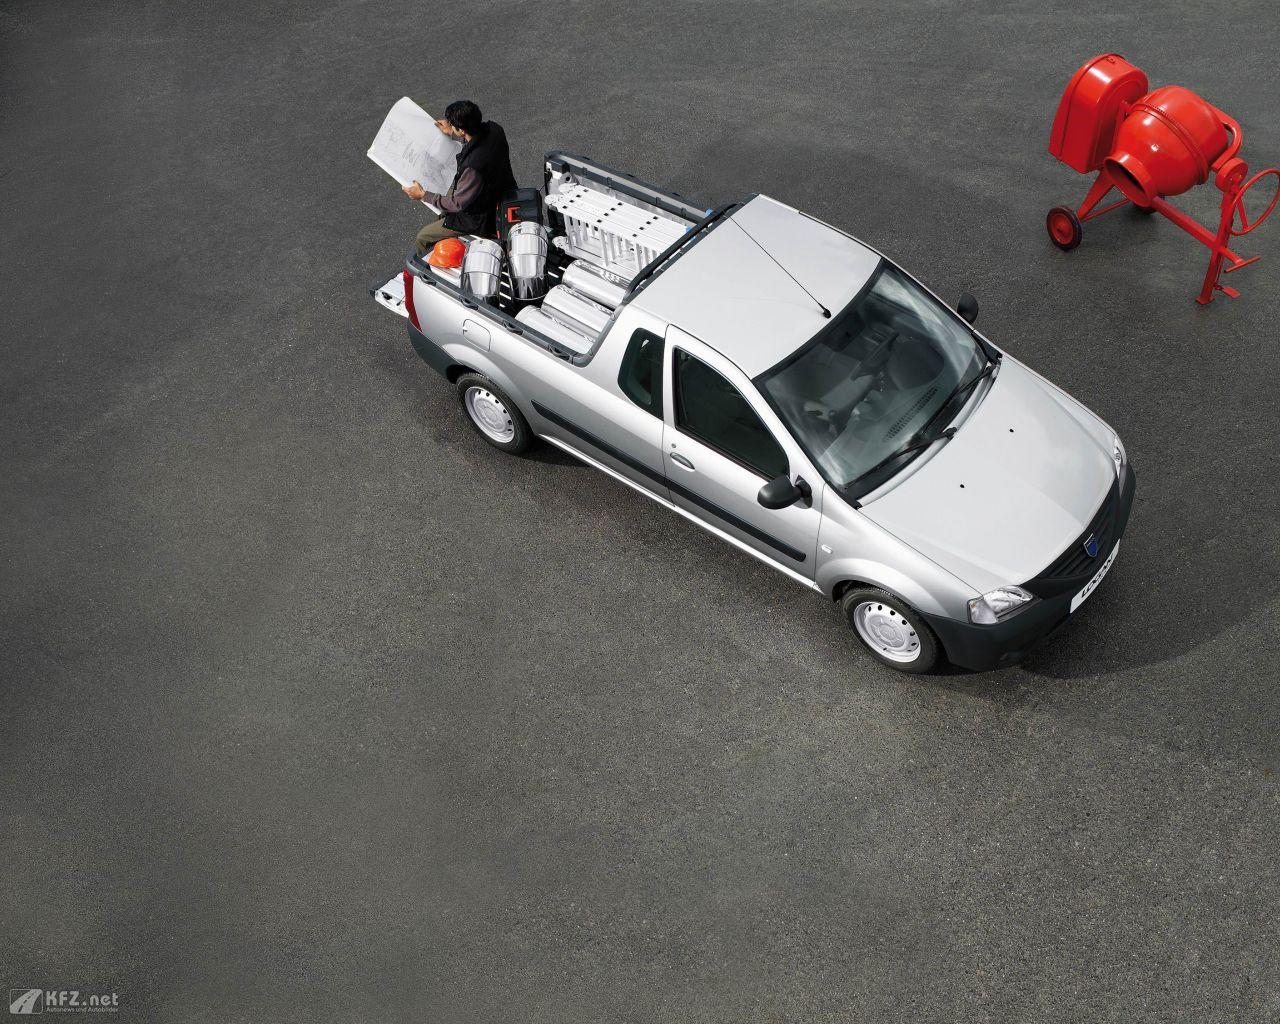 dacia-pick-up-1280x1024-121